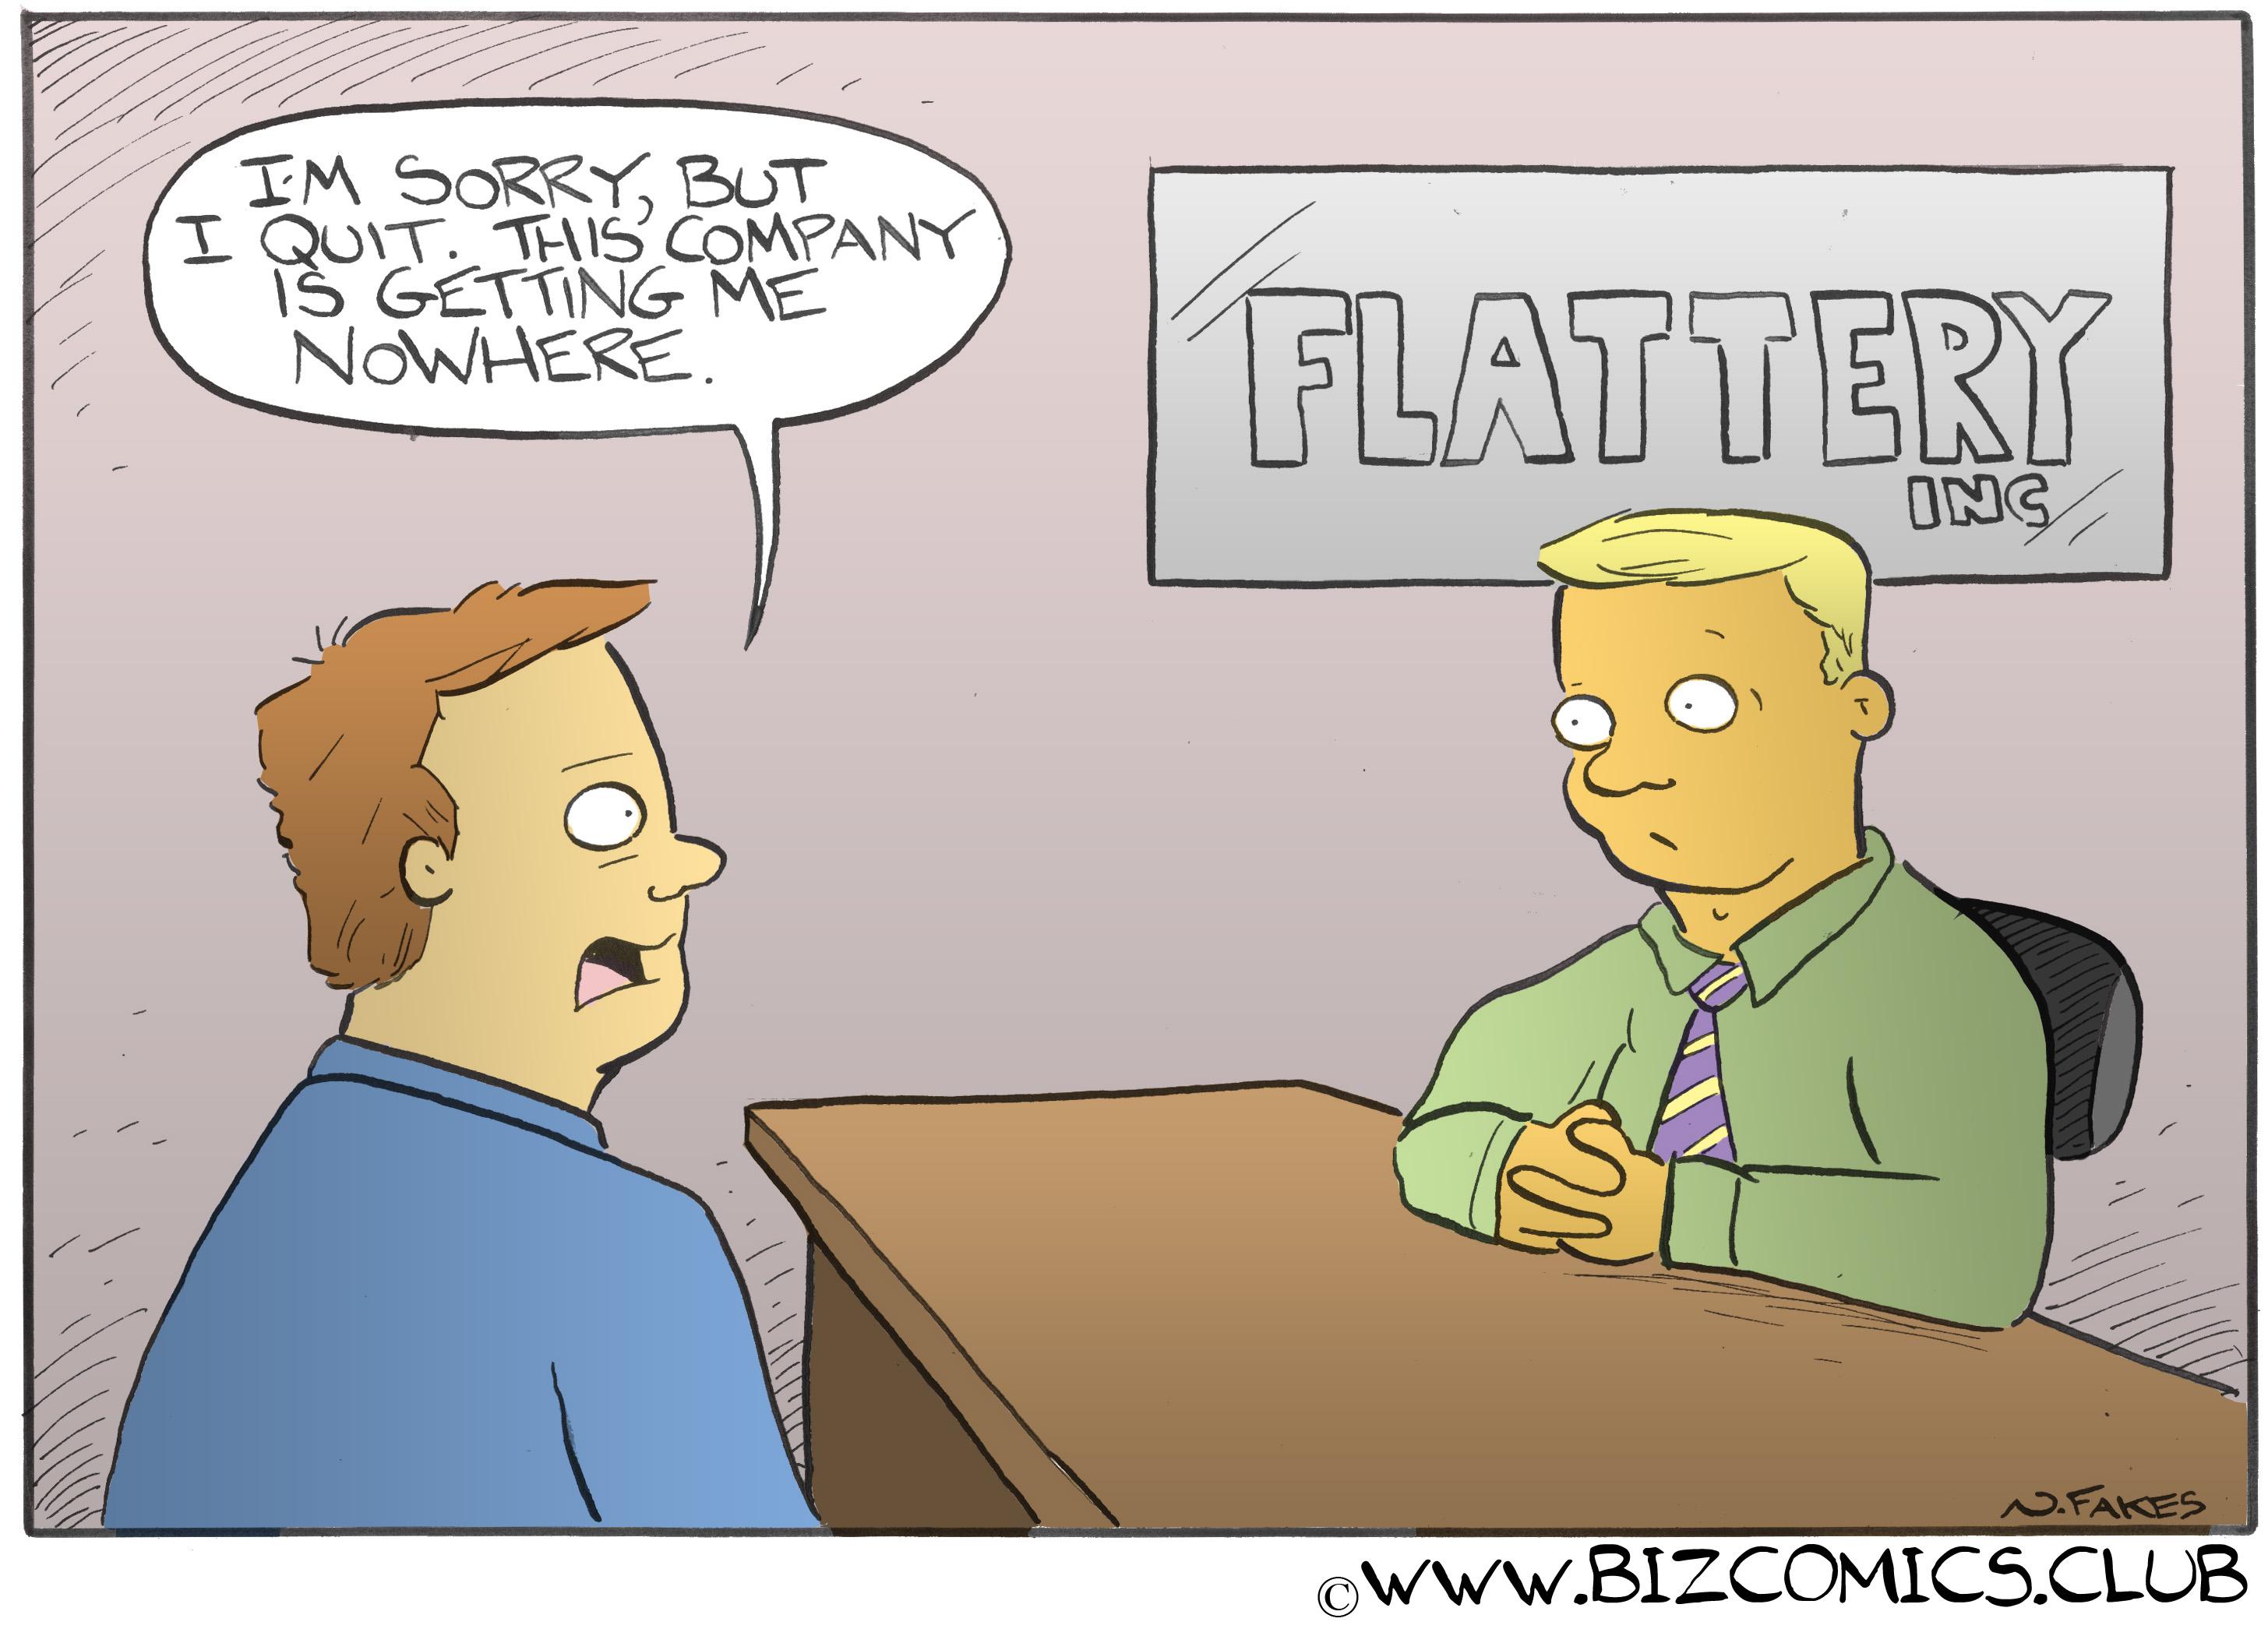 Go Flatter Yourself